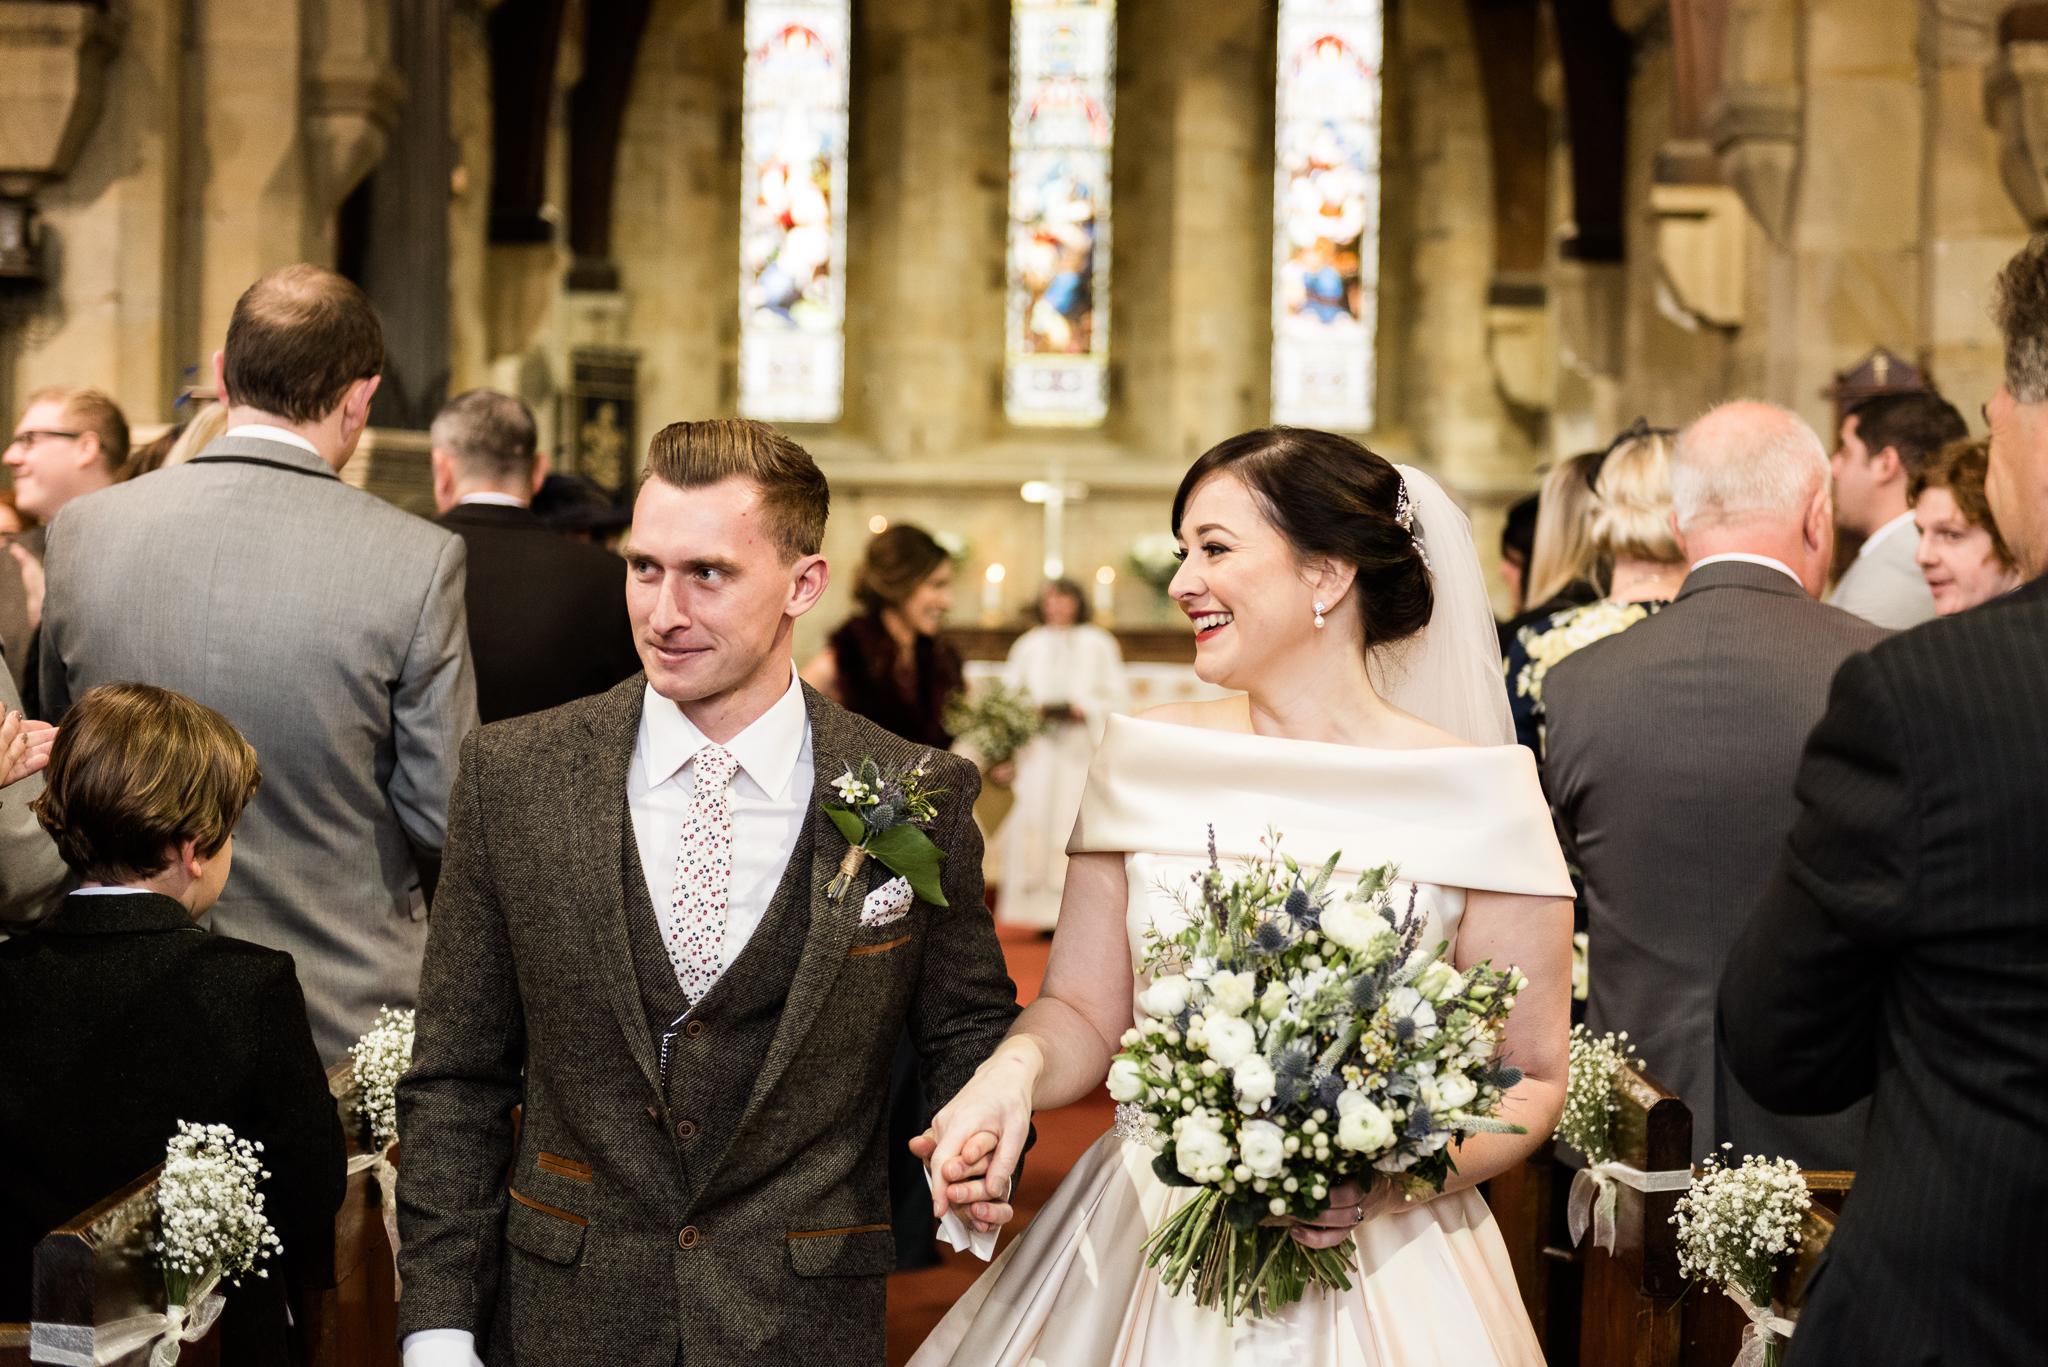 Yorkshire Wedding Photography Spring Wedding Cubley Hall Rustic Barn-28.jpg